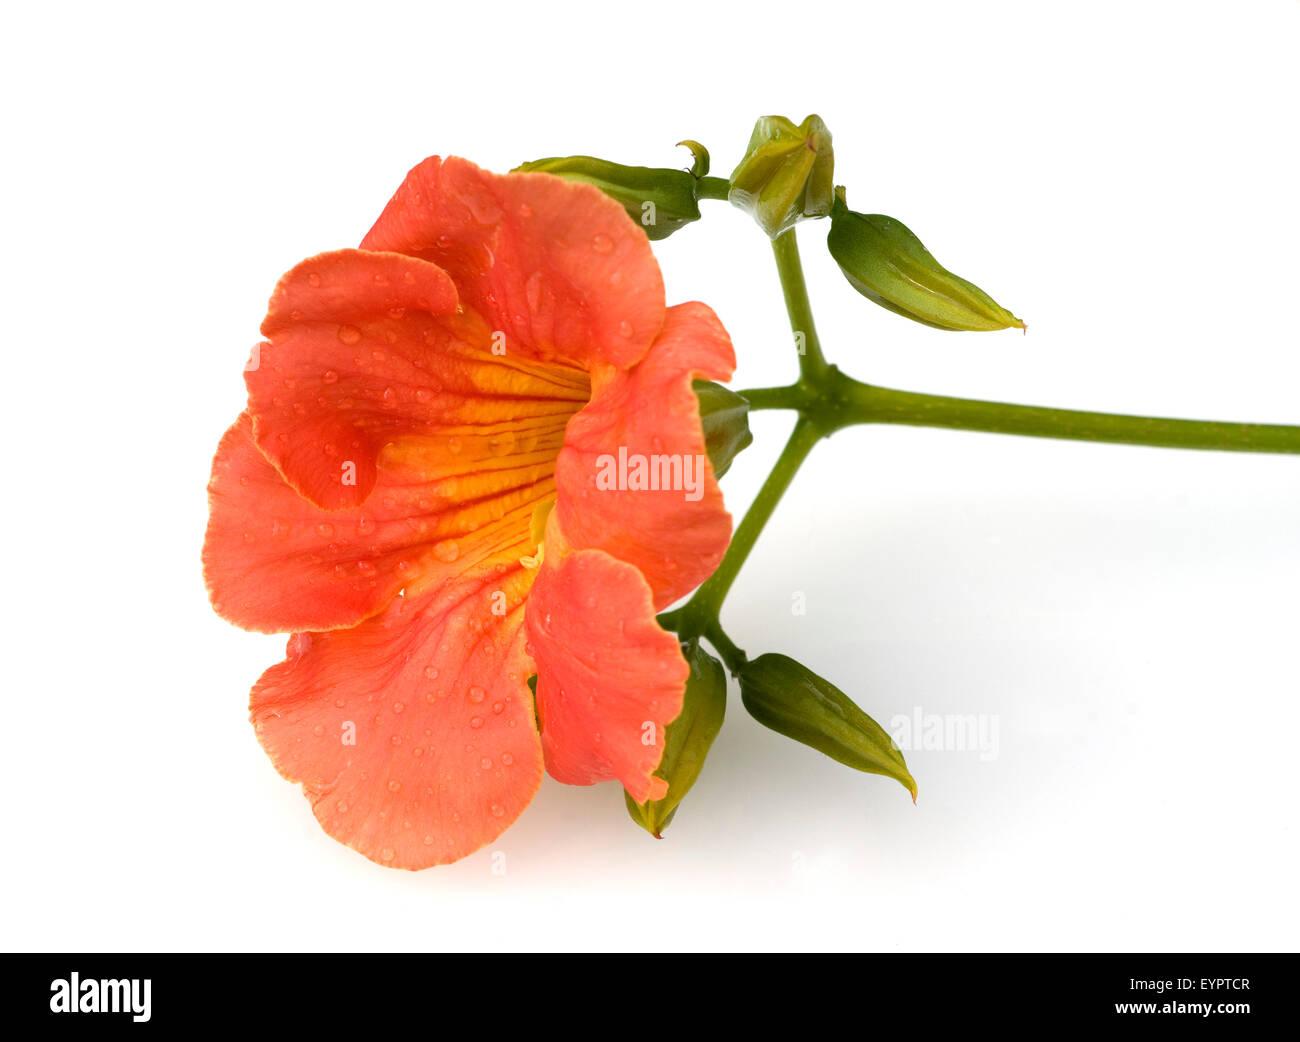 Trompetenwinde, Trompetenblume, Campsis radicans, Stock Photo